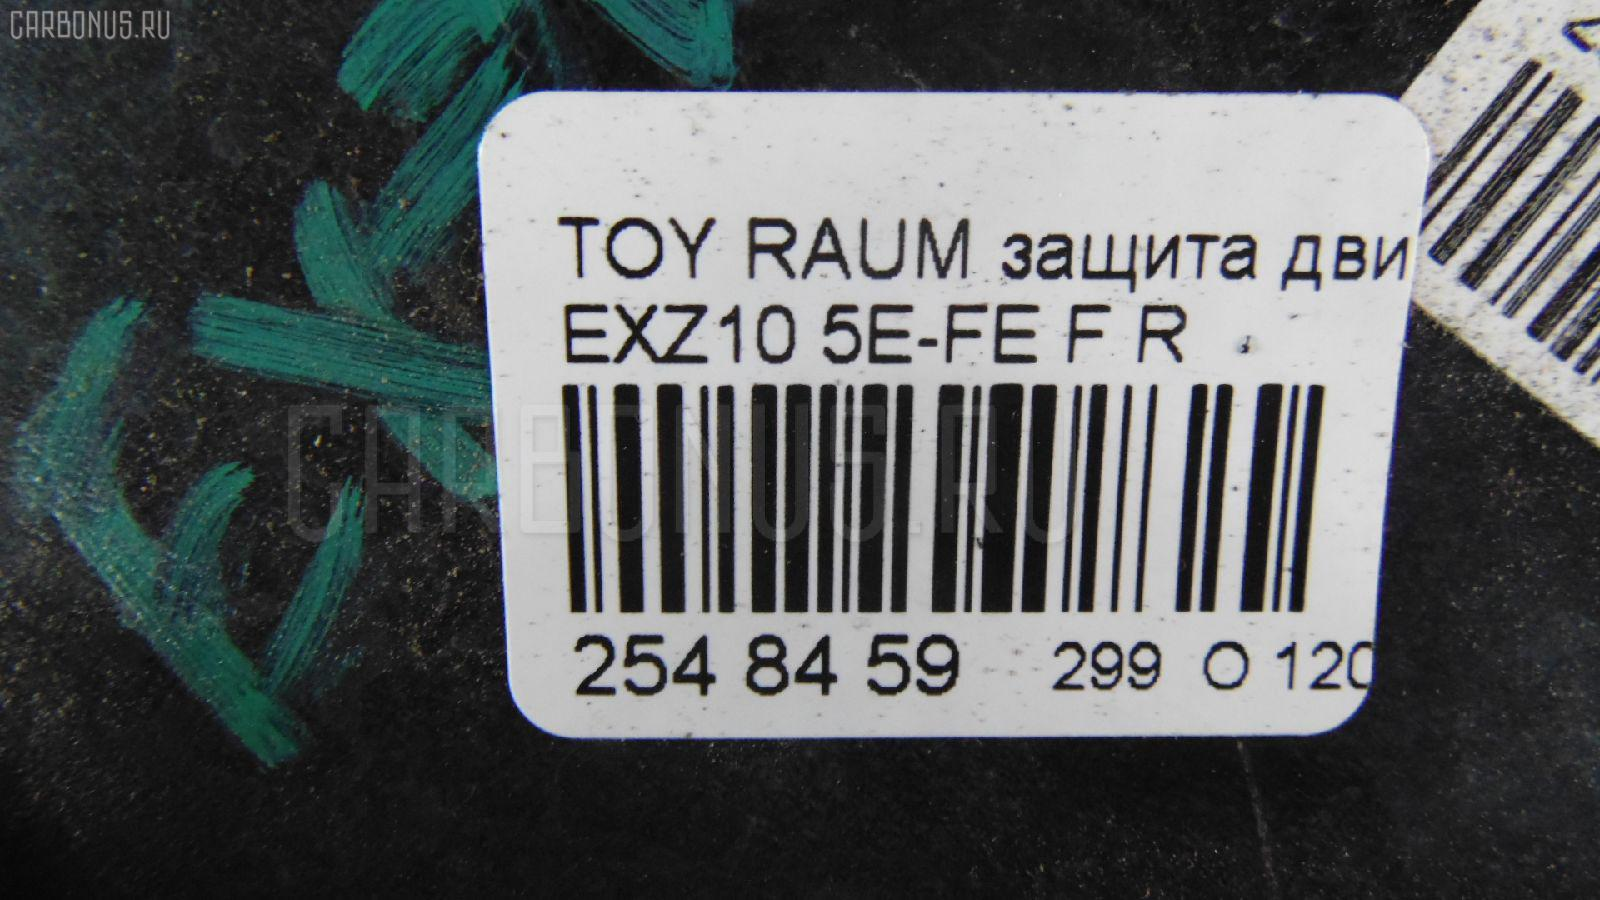 Защита двигателя TOYOTA RAUM EXZ10 5E-FE Фото 2